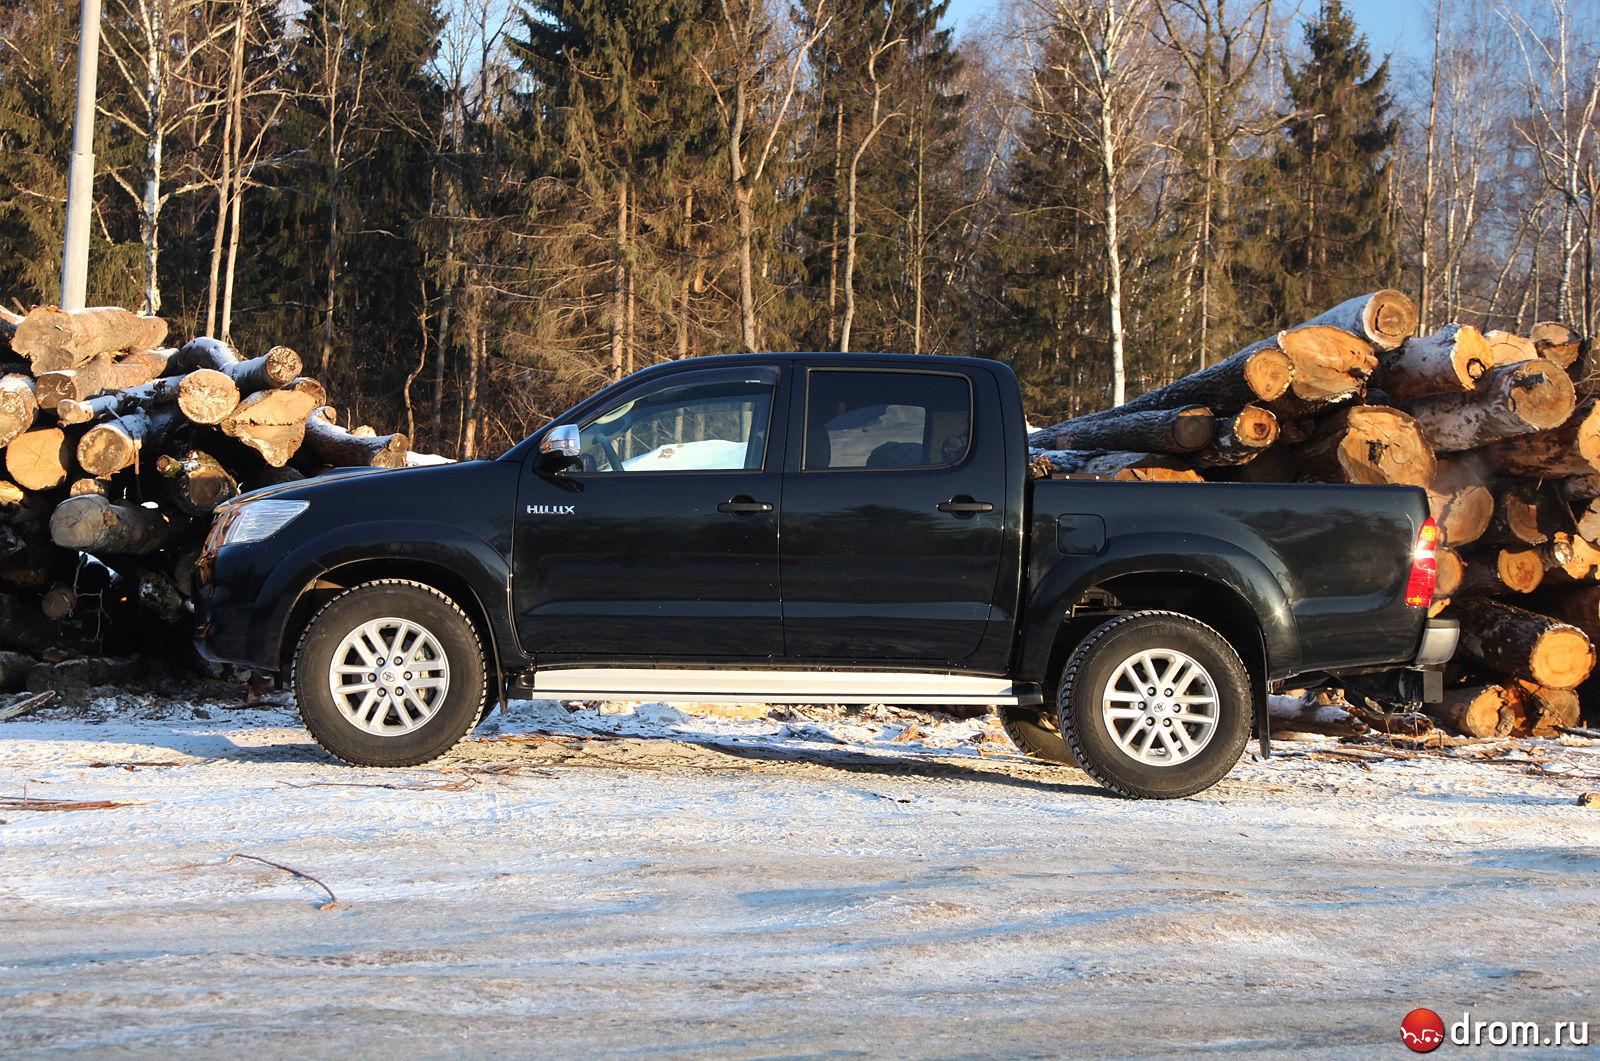 Toyota Hilux drom #10